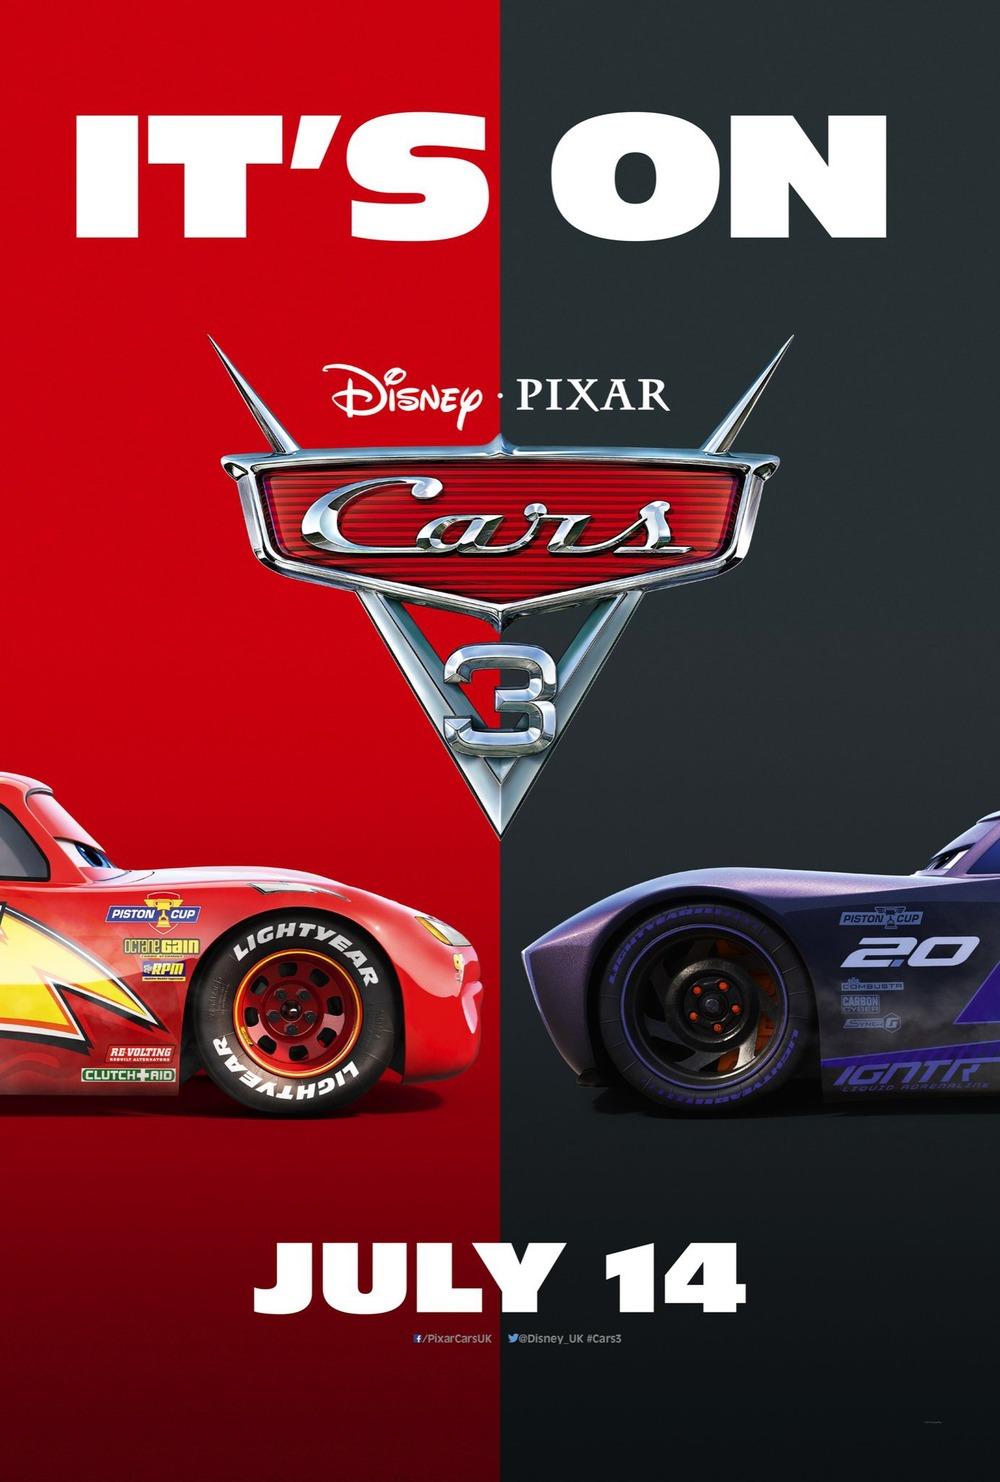 Cars 3 release date